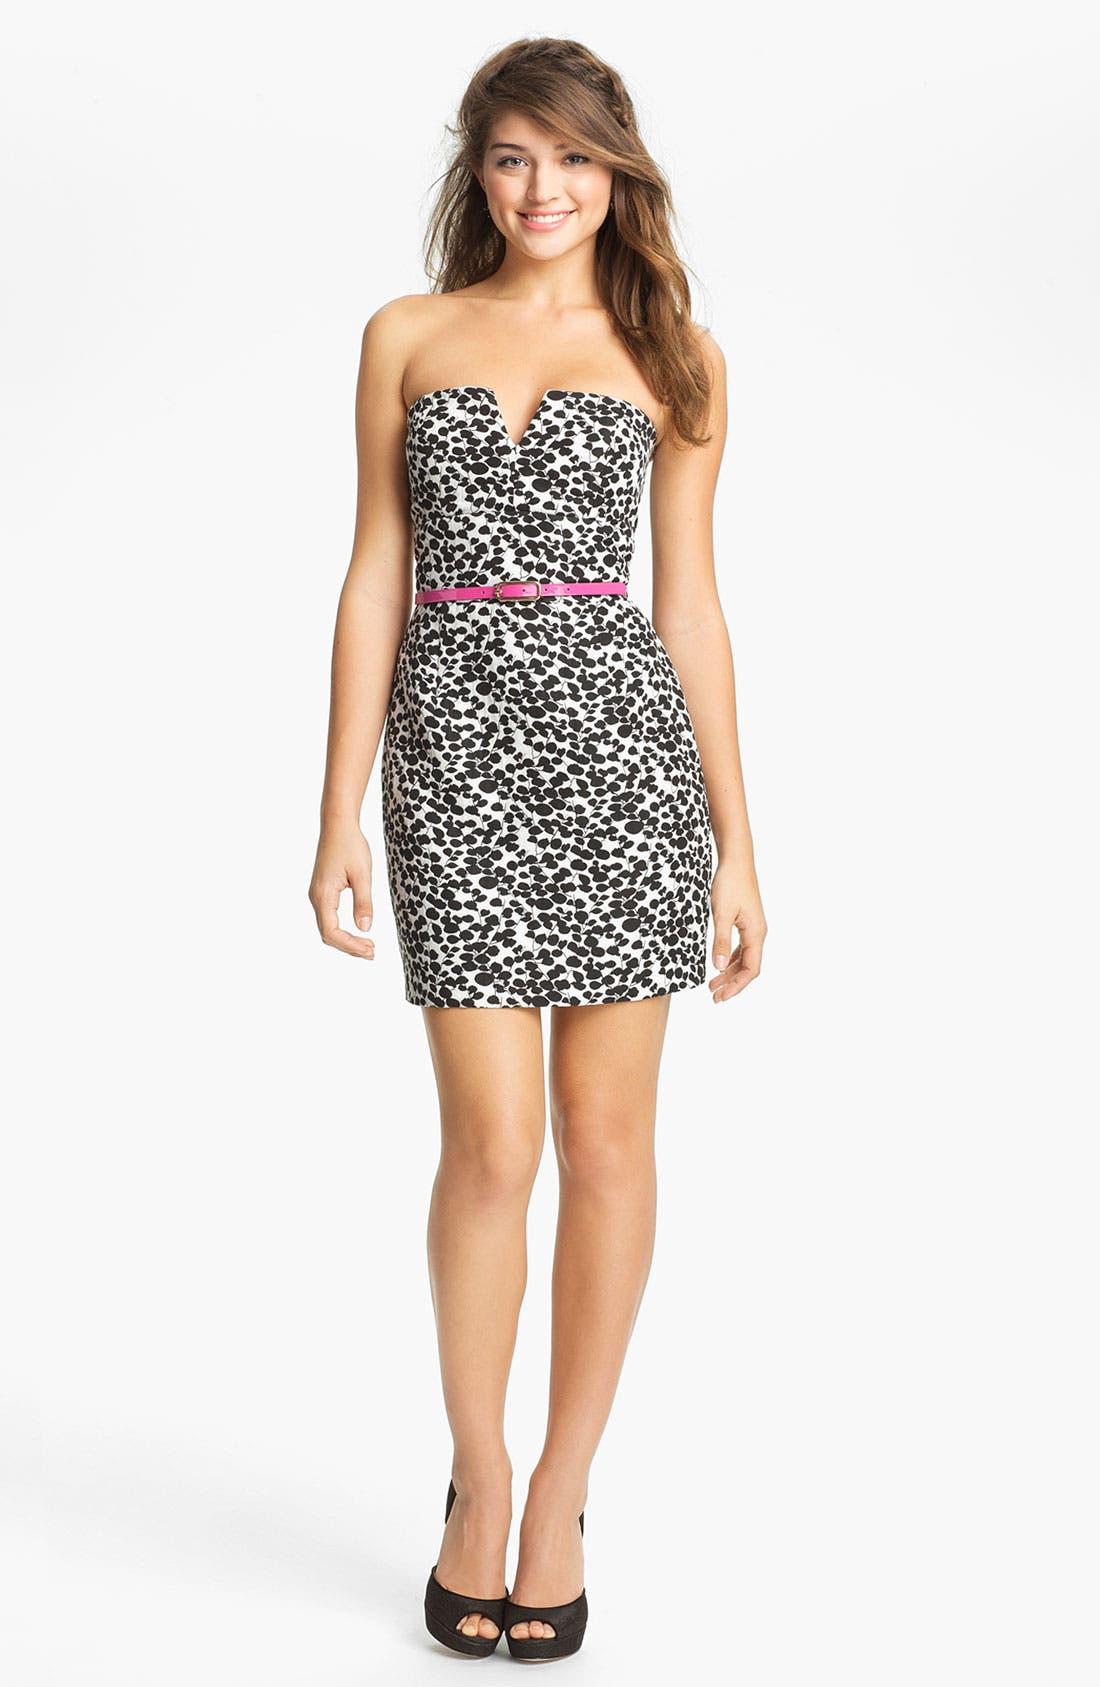 Main Image - Max & Cleo Print Strapless Sheath Dress